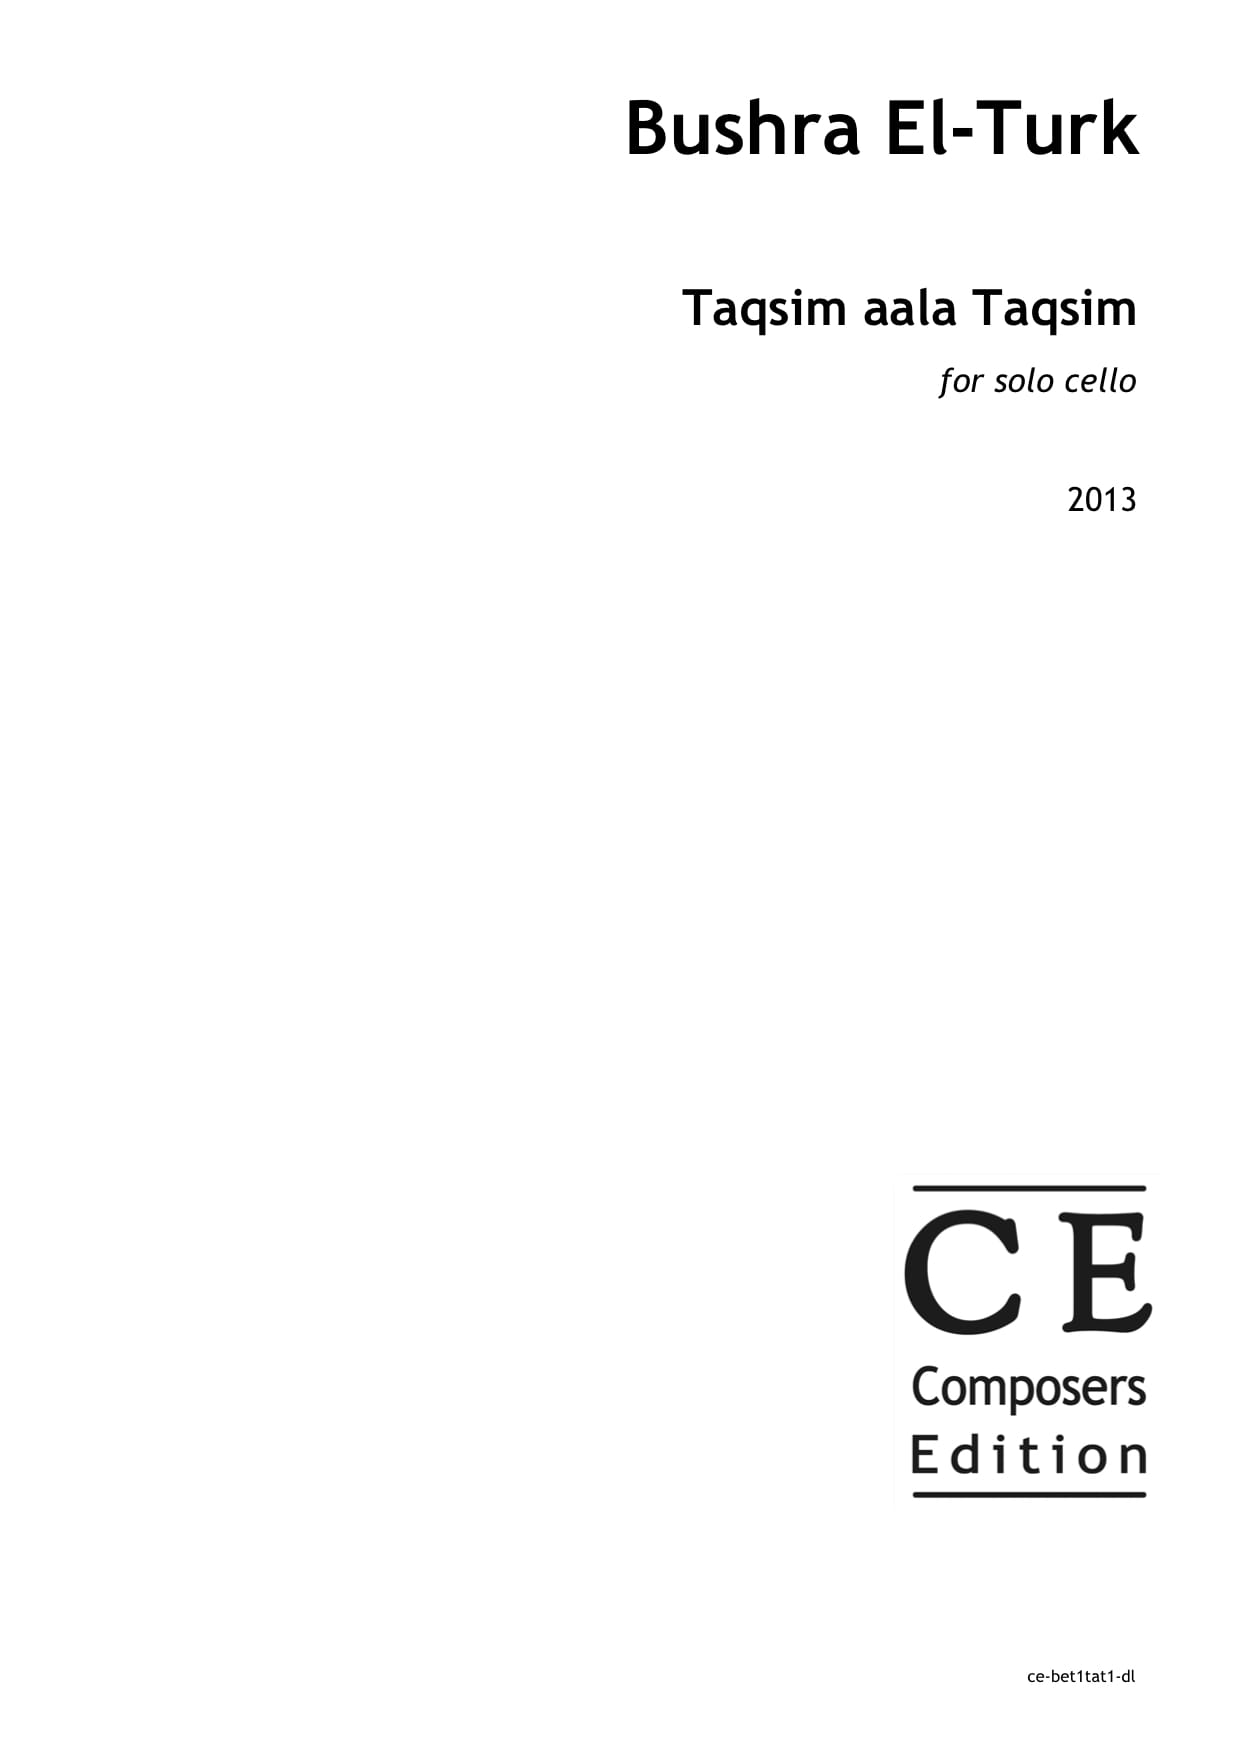 Bushra El-Turk: Taqsim aala Taqsim for solo cello